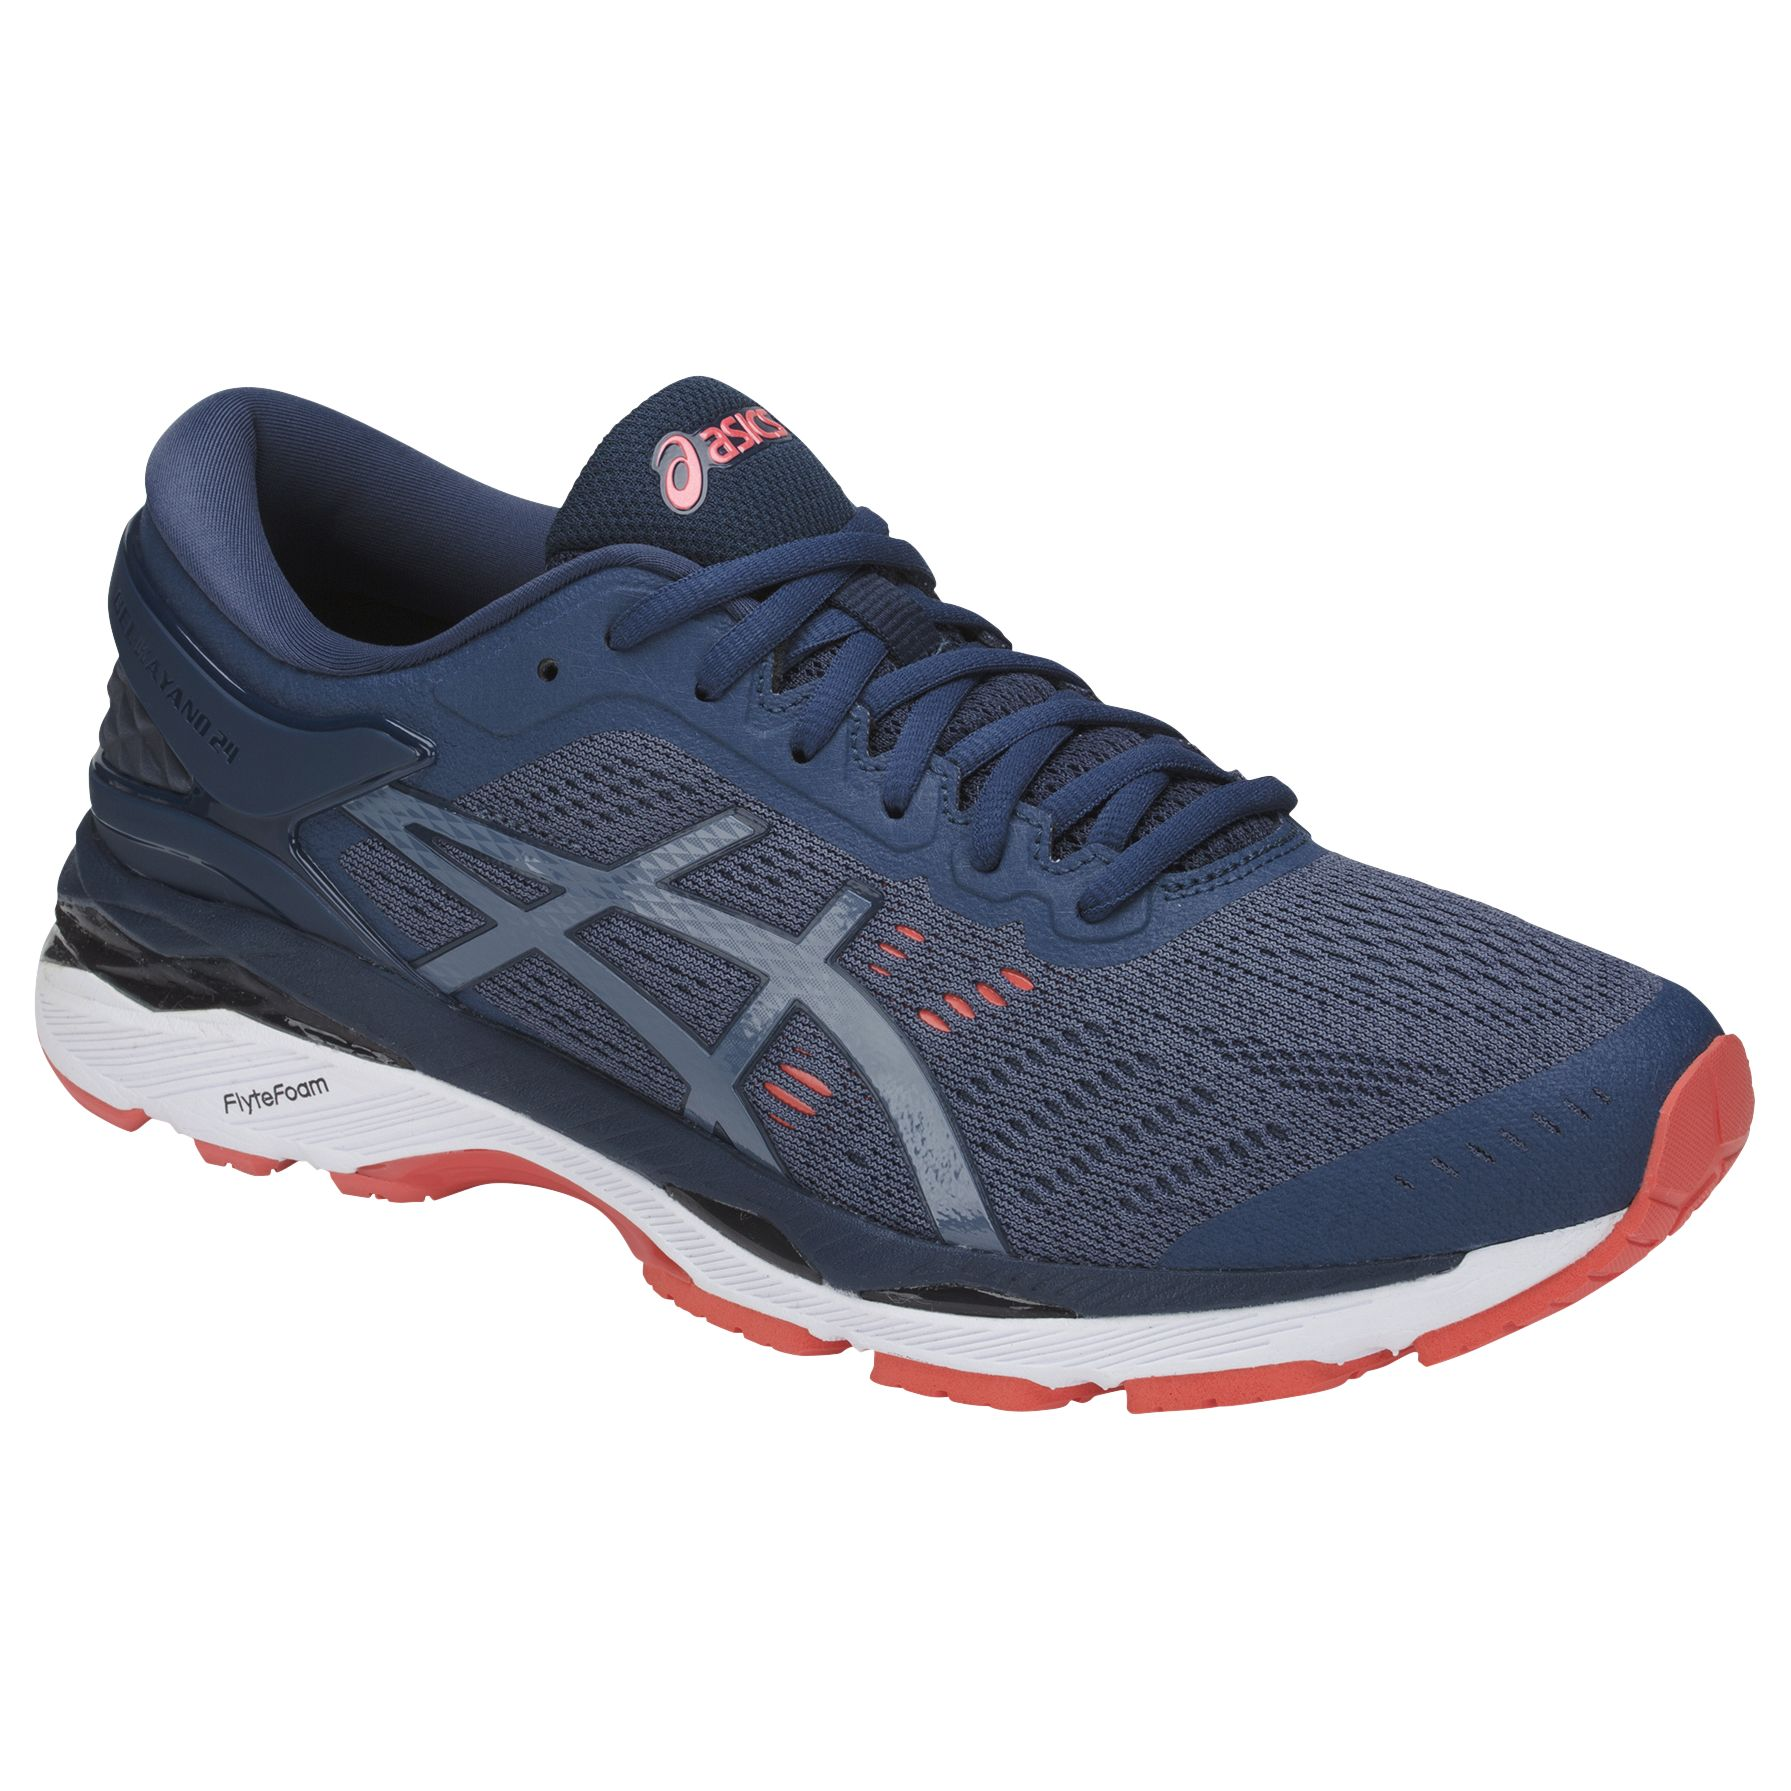 d840657b0825d Asics GEL-KAYANO 24 Men's Structured Running Shoes, Smoke Blue/Dark Blue,  Smoke Blue/Dark Blue